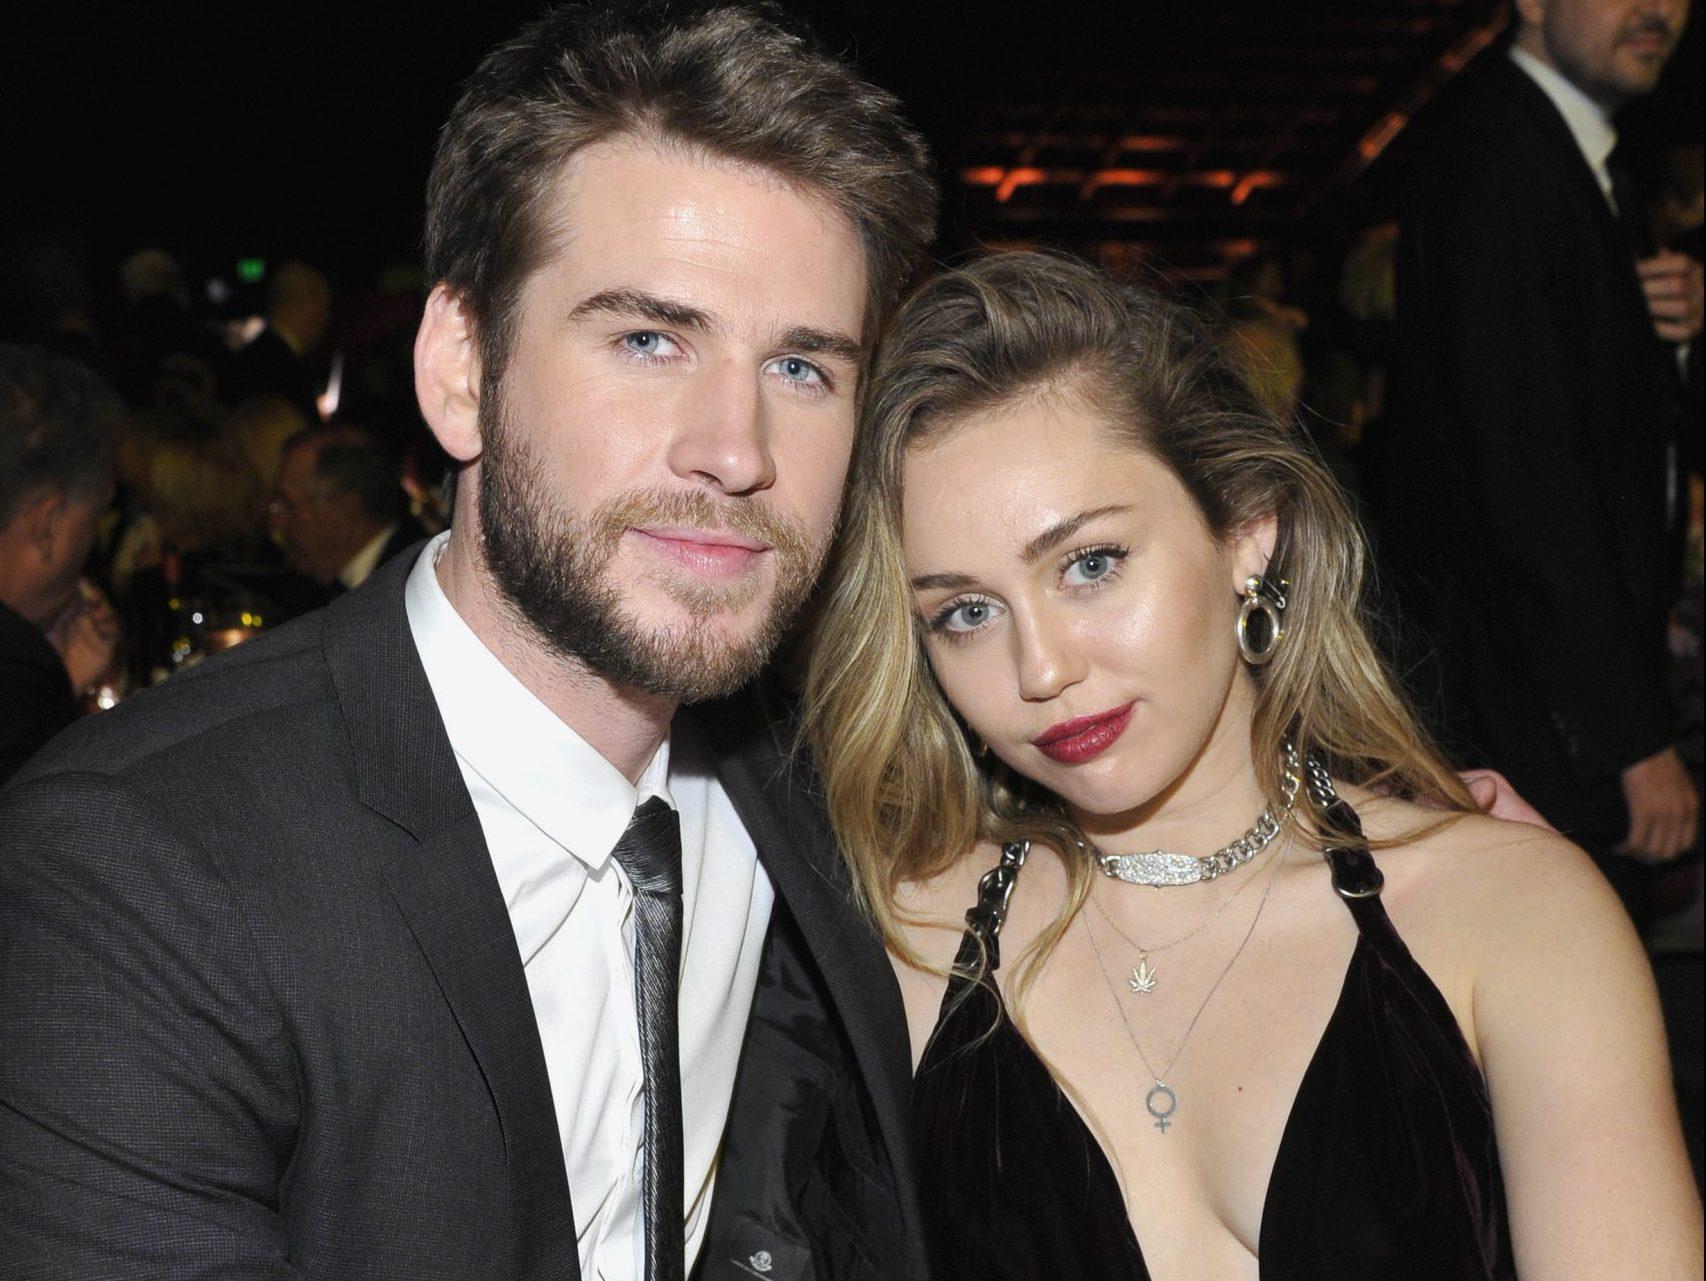 Liam Hemsworth 'loving' married life with 'sweet, sweet angel' Miley Cyrus